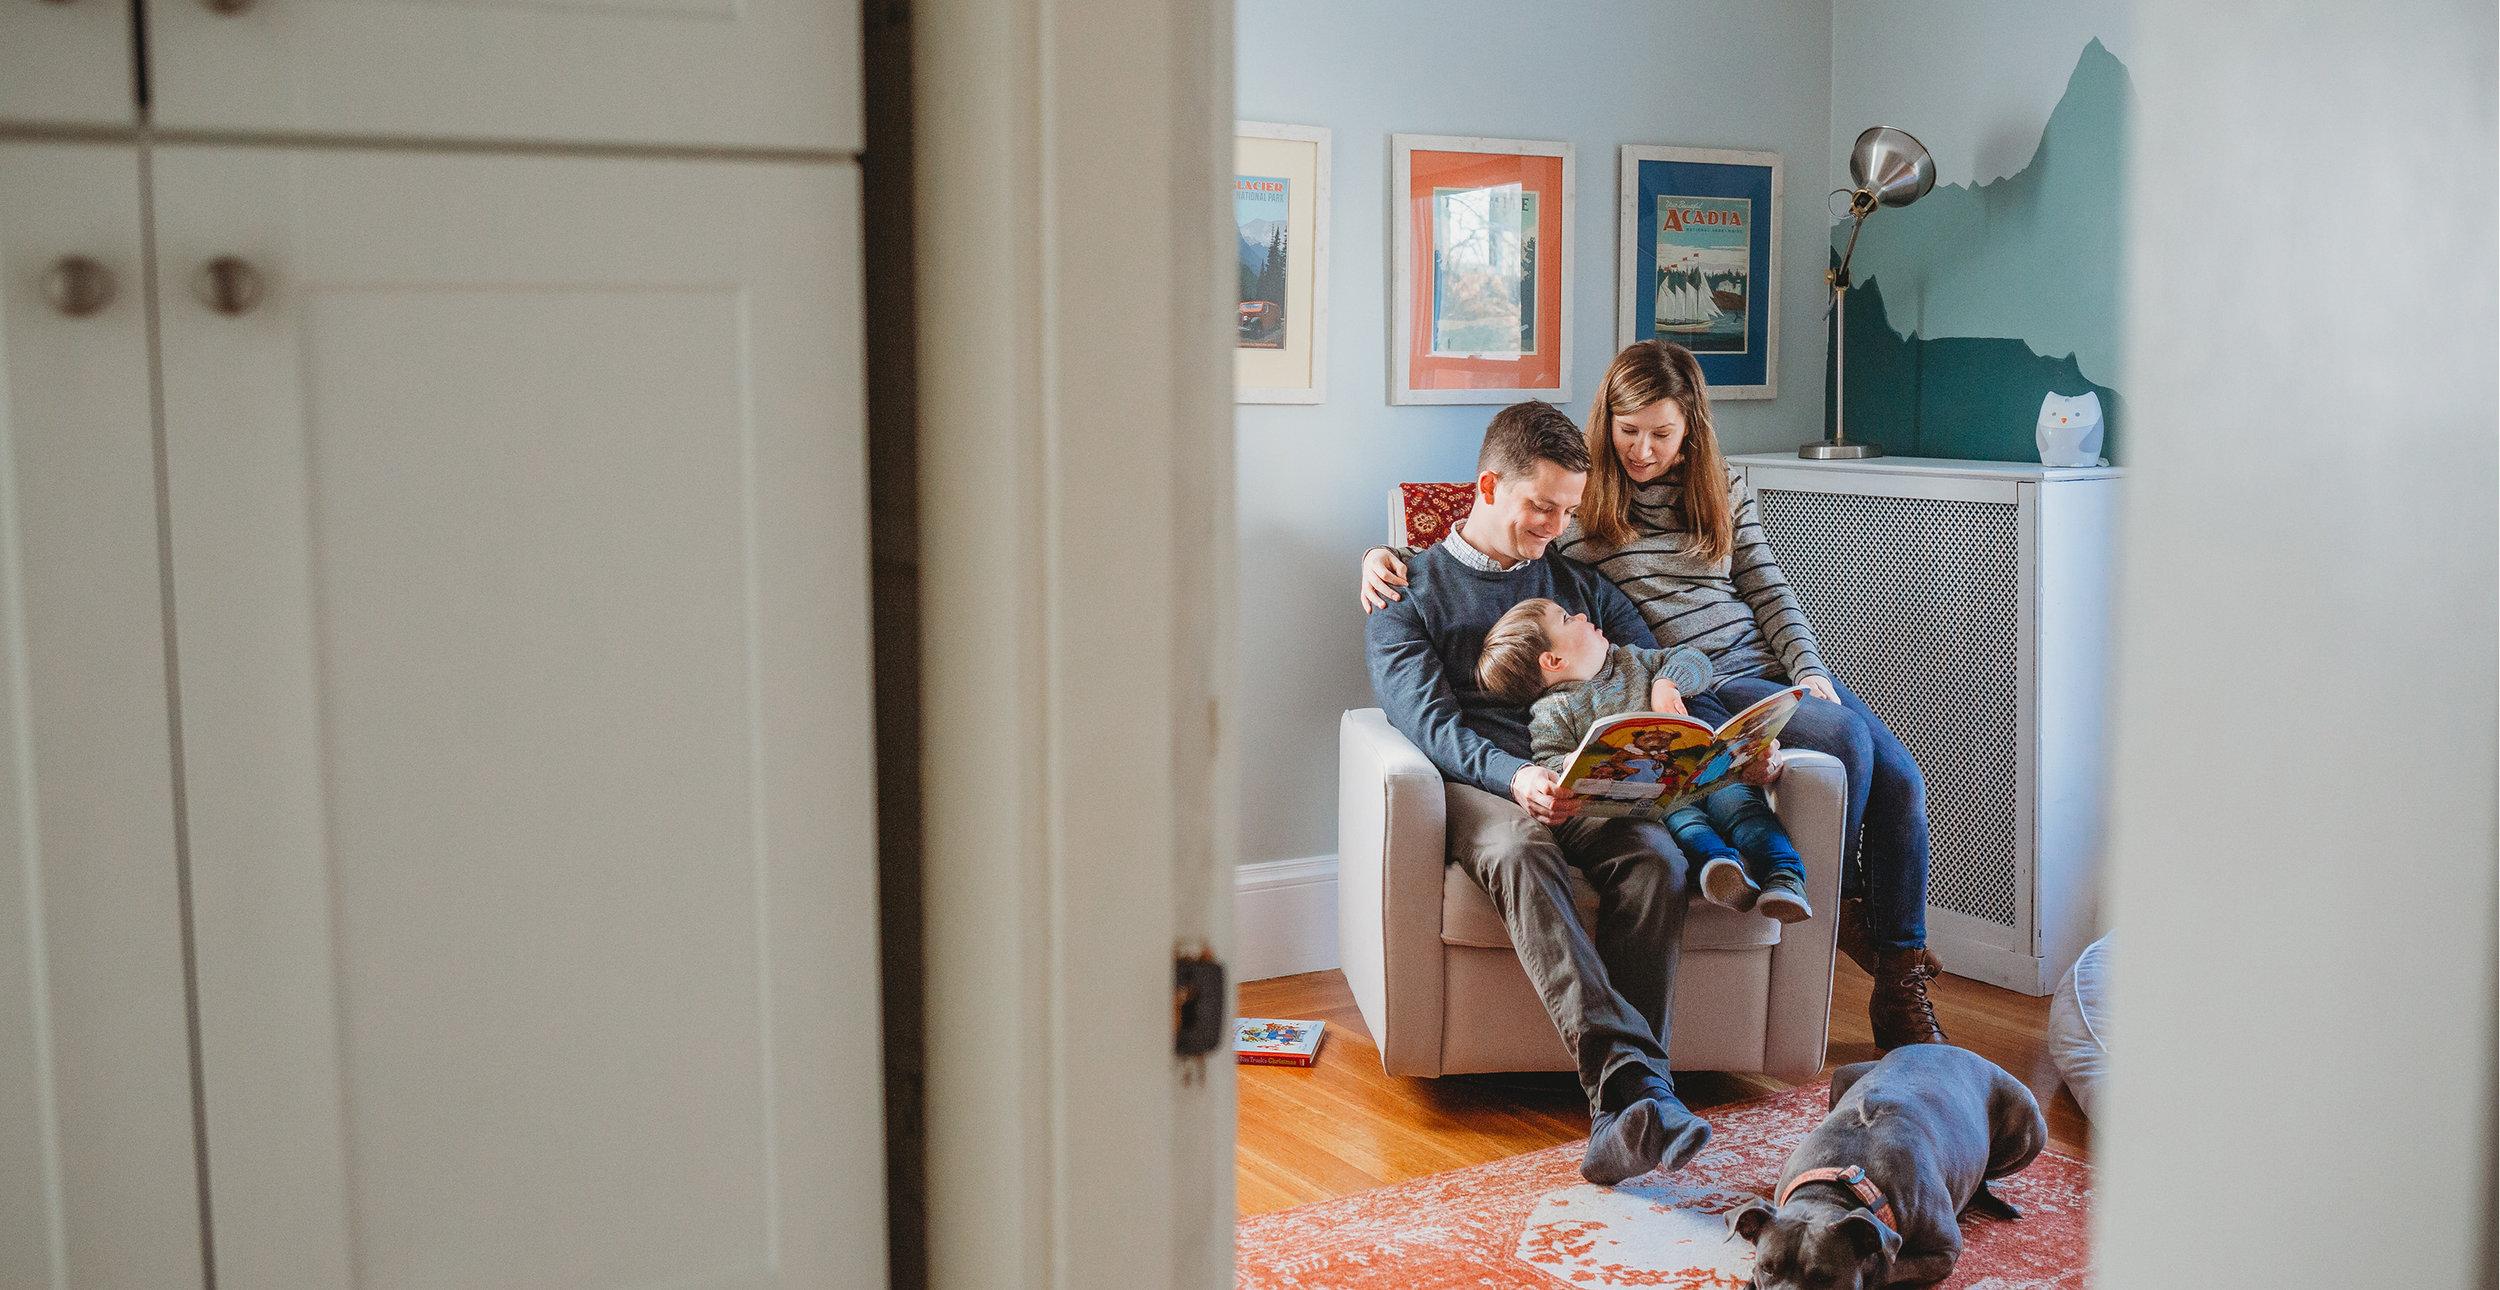 joyleducphotography-bostonfamilyphotographer-lifestyleportraiture-7.jpg